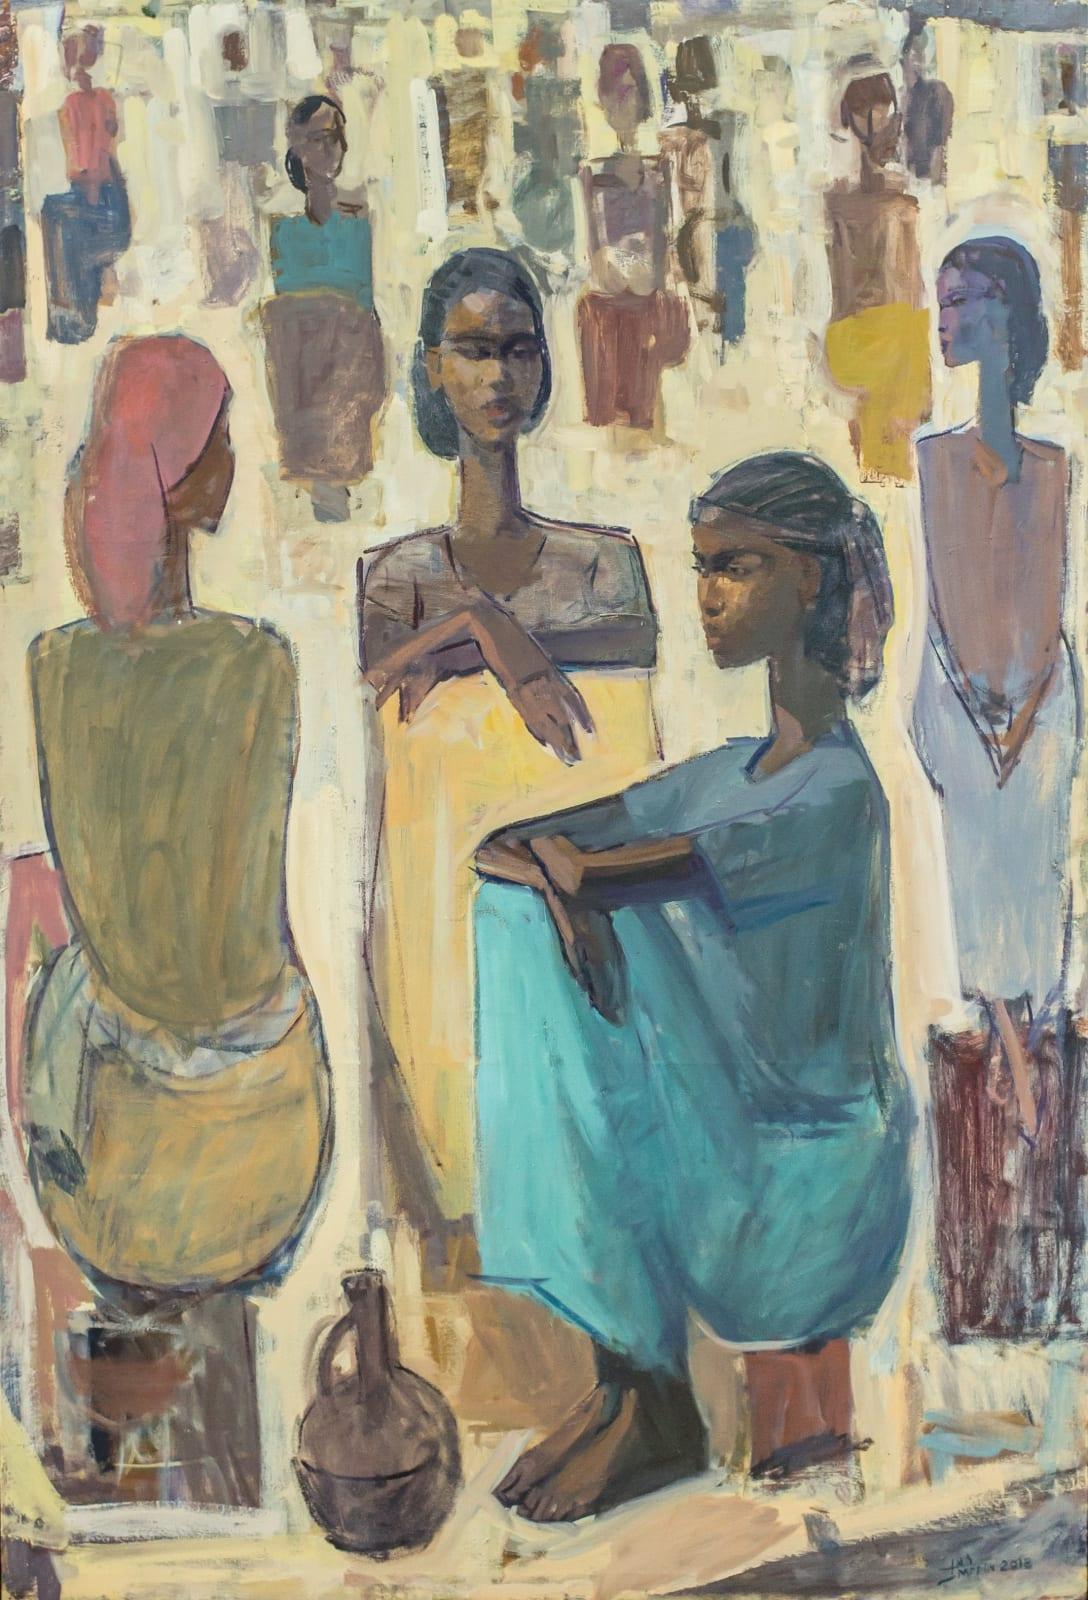 Tadesse Mesfin, Pillars of Life: Guleet, 2018